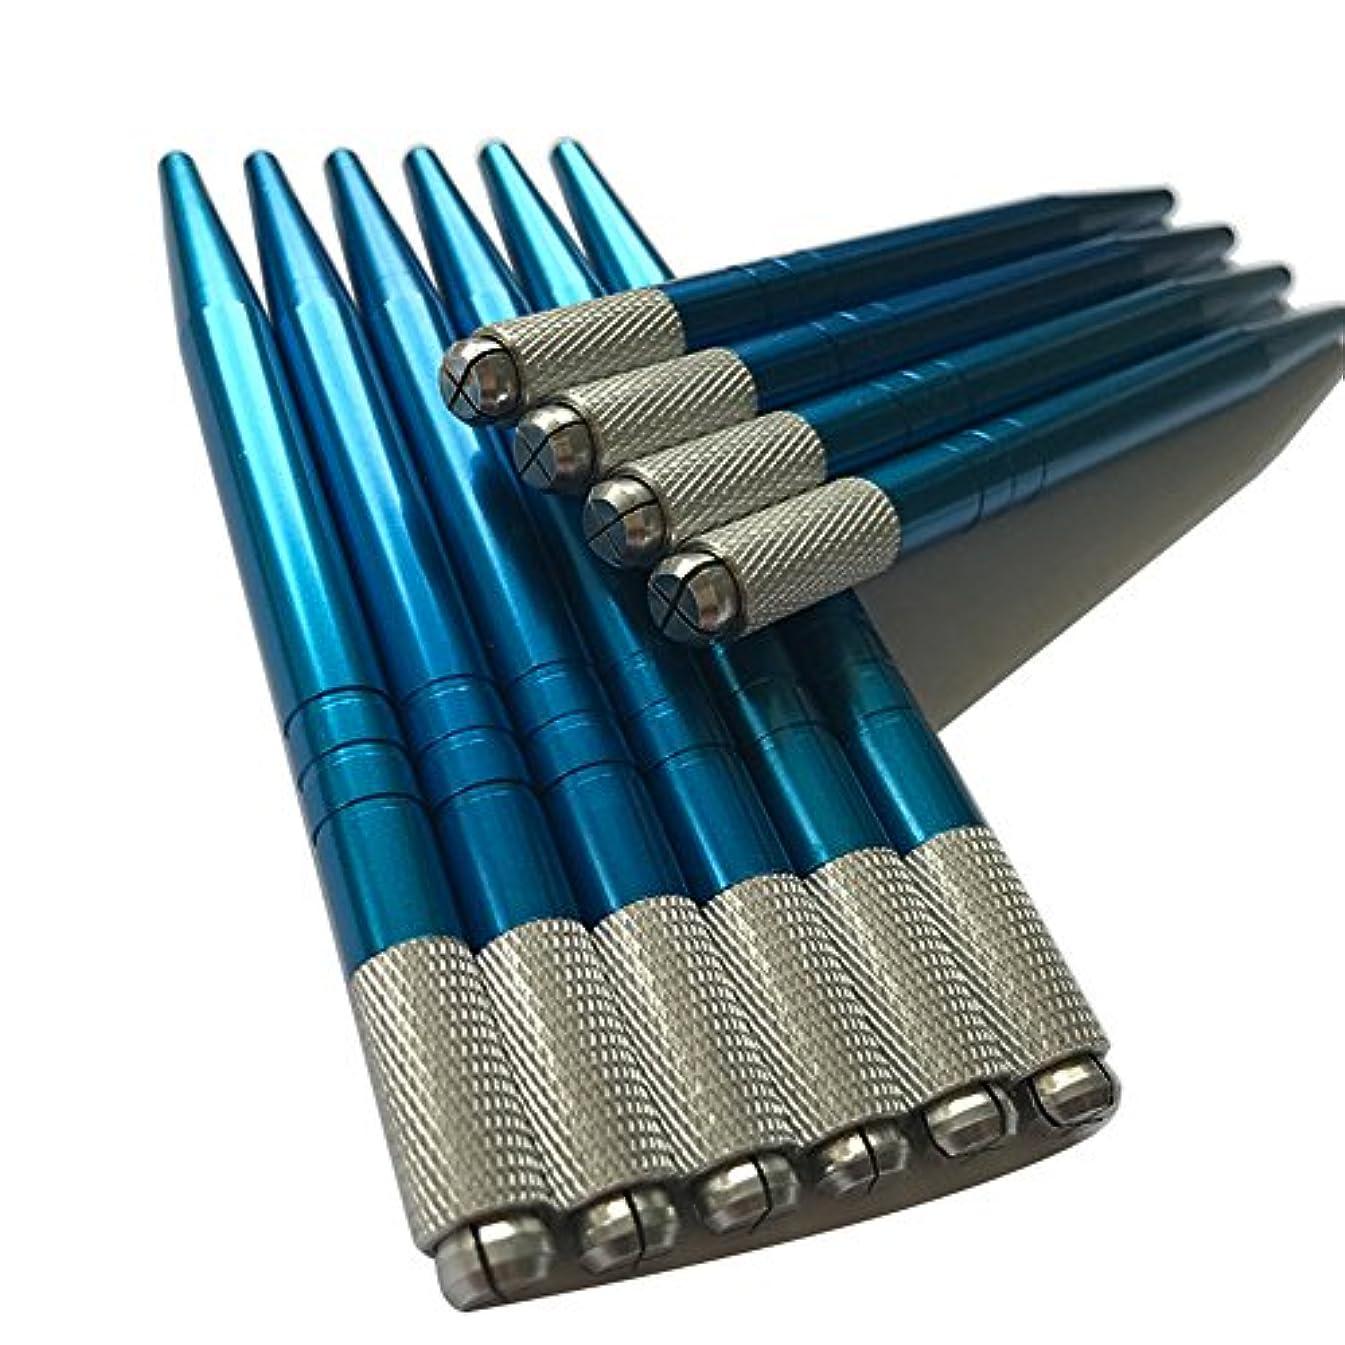 Microblading Pen Blue Color 10pcs Wholesale Permanent Makeup Manual Eyebrow Tattoo Supplies -QMYBrow